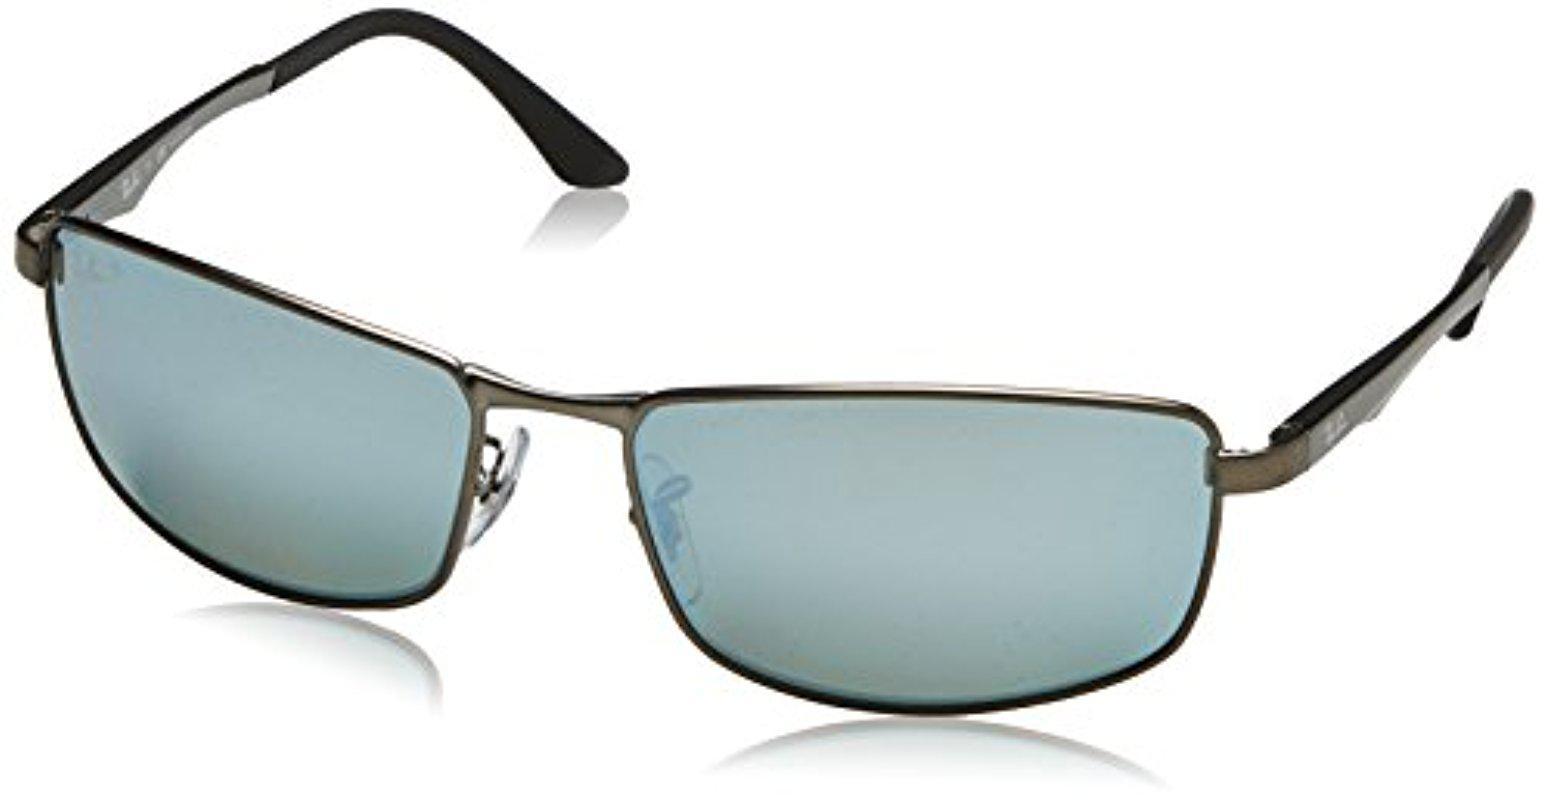 Lyst - Ray-Ban Rb3498 029 y4 Polarized Sunglasses ed4839157cd